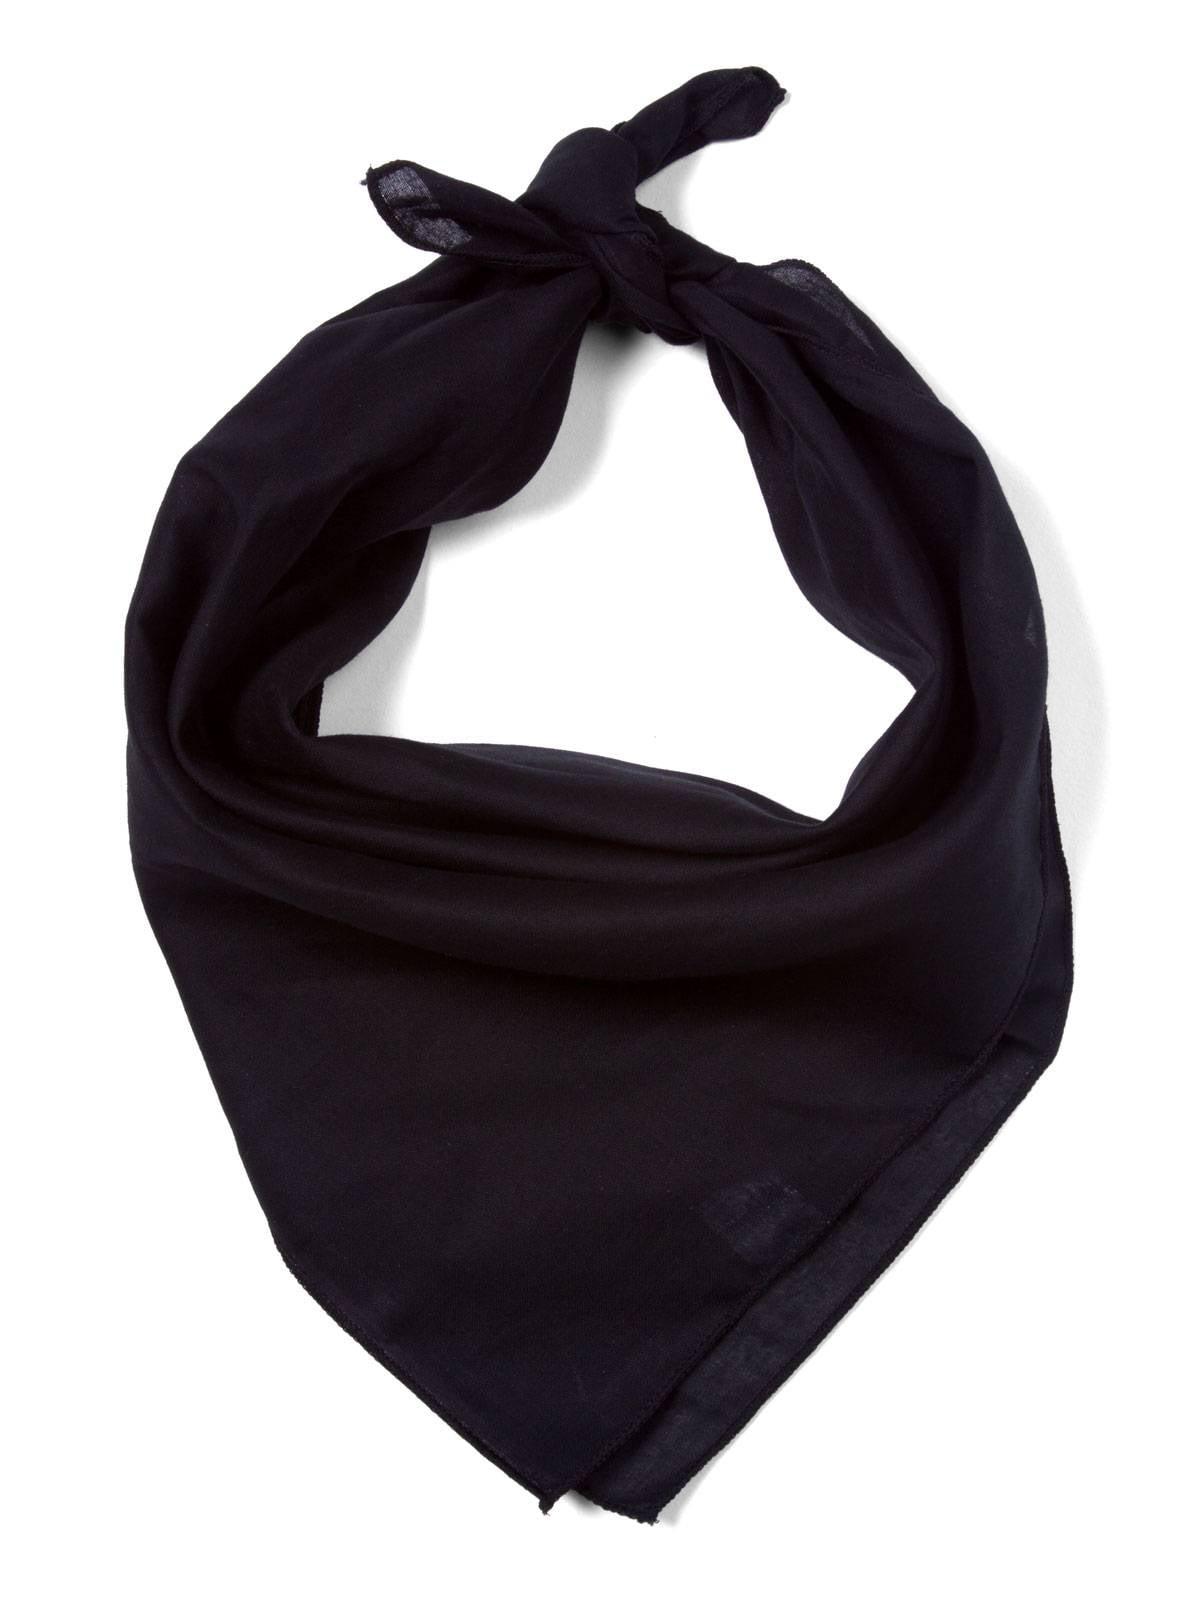 Plain BLACK cotton Bandana scarf by Girlyshop